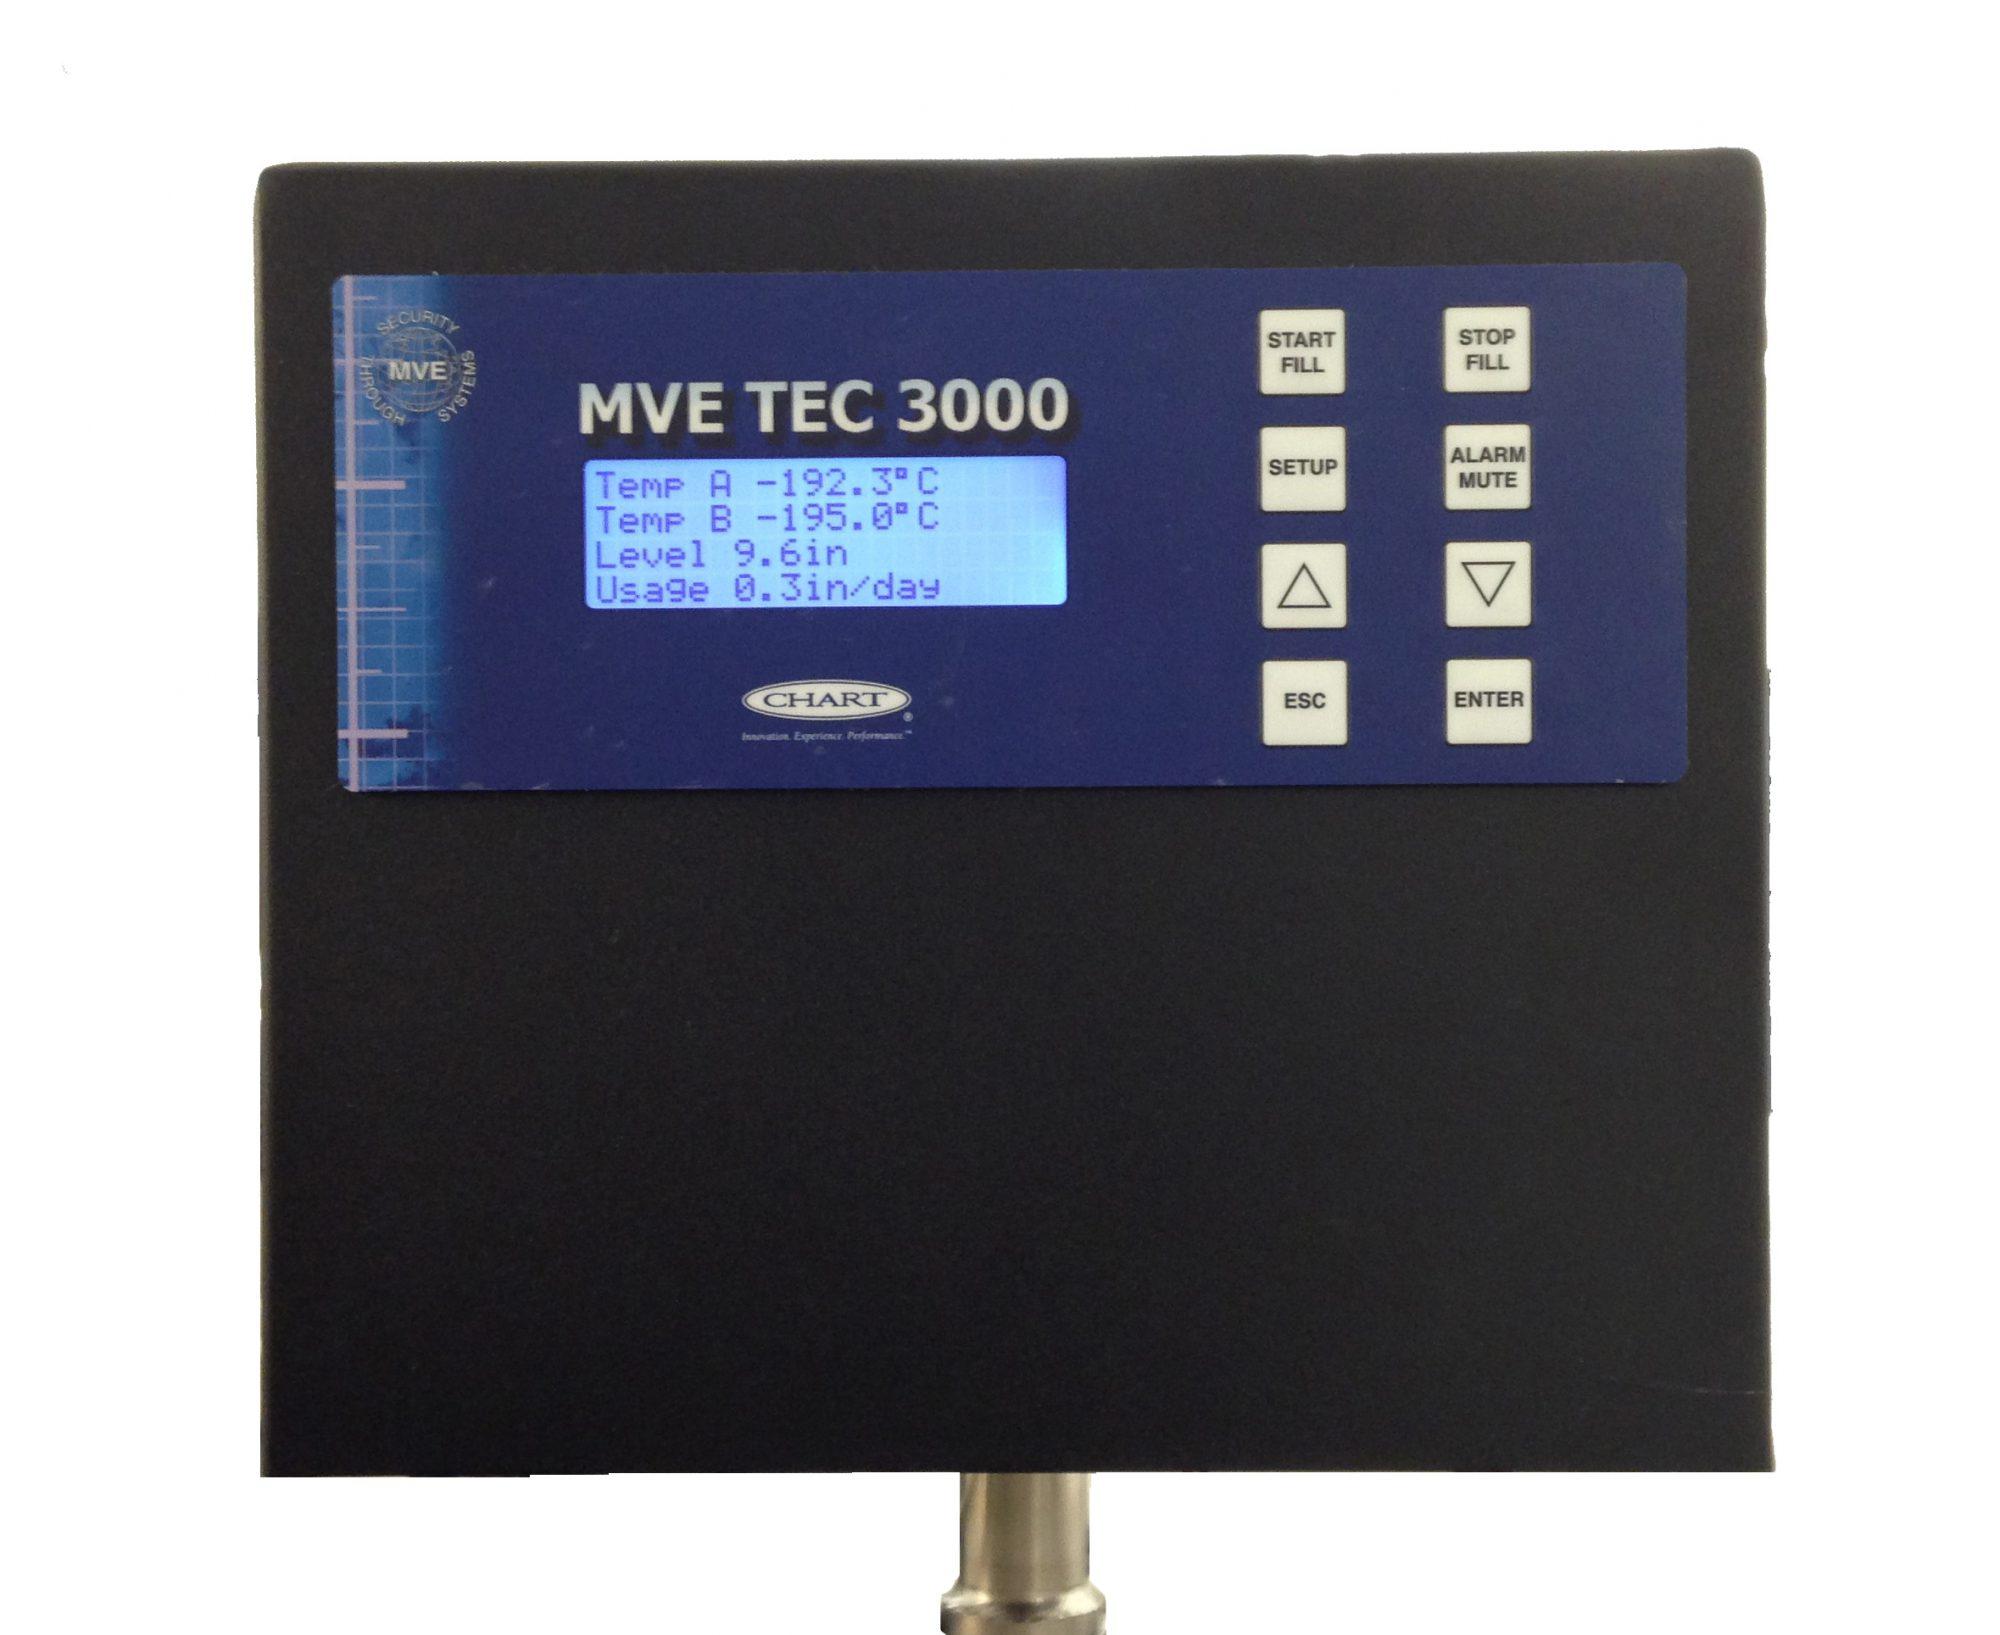 MVE TEC 3000